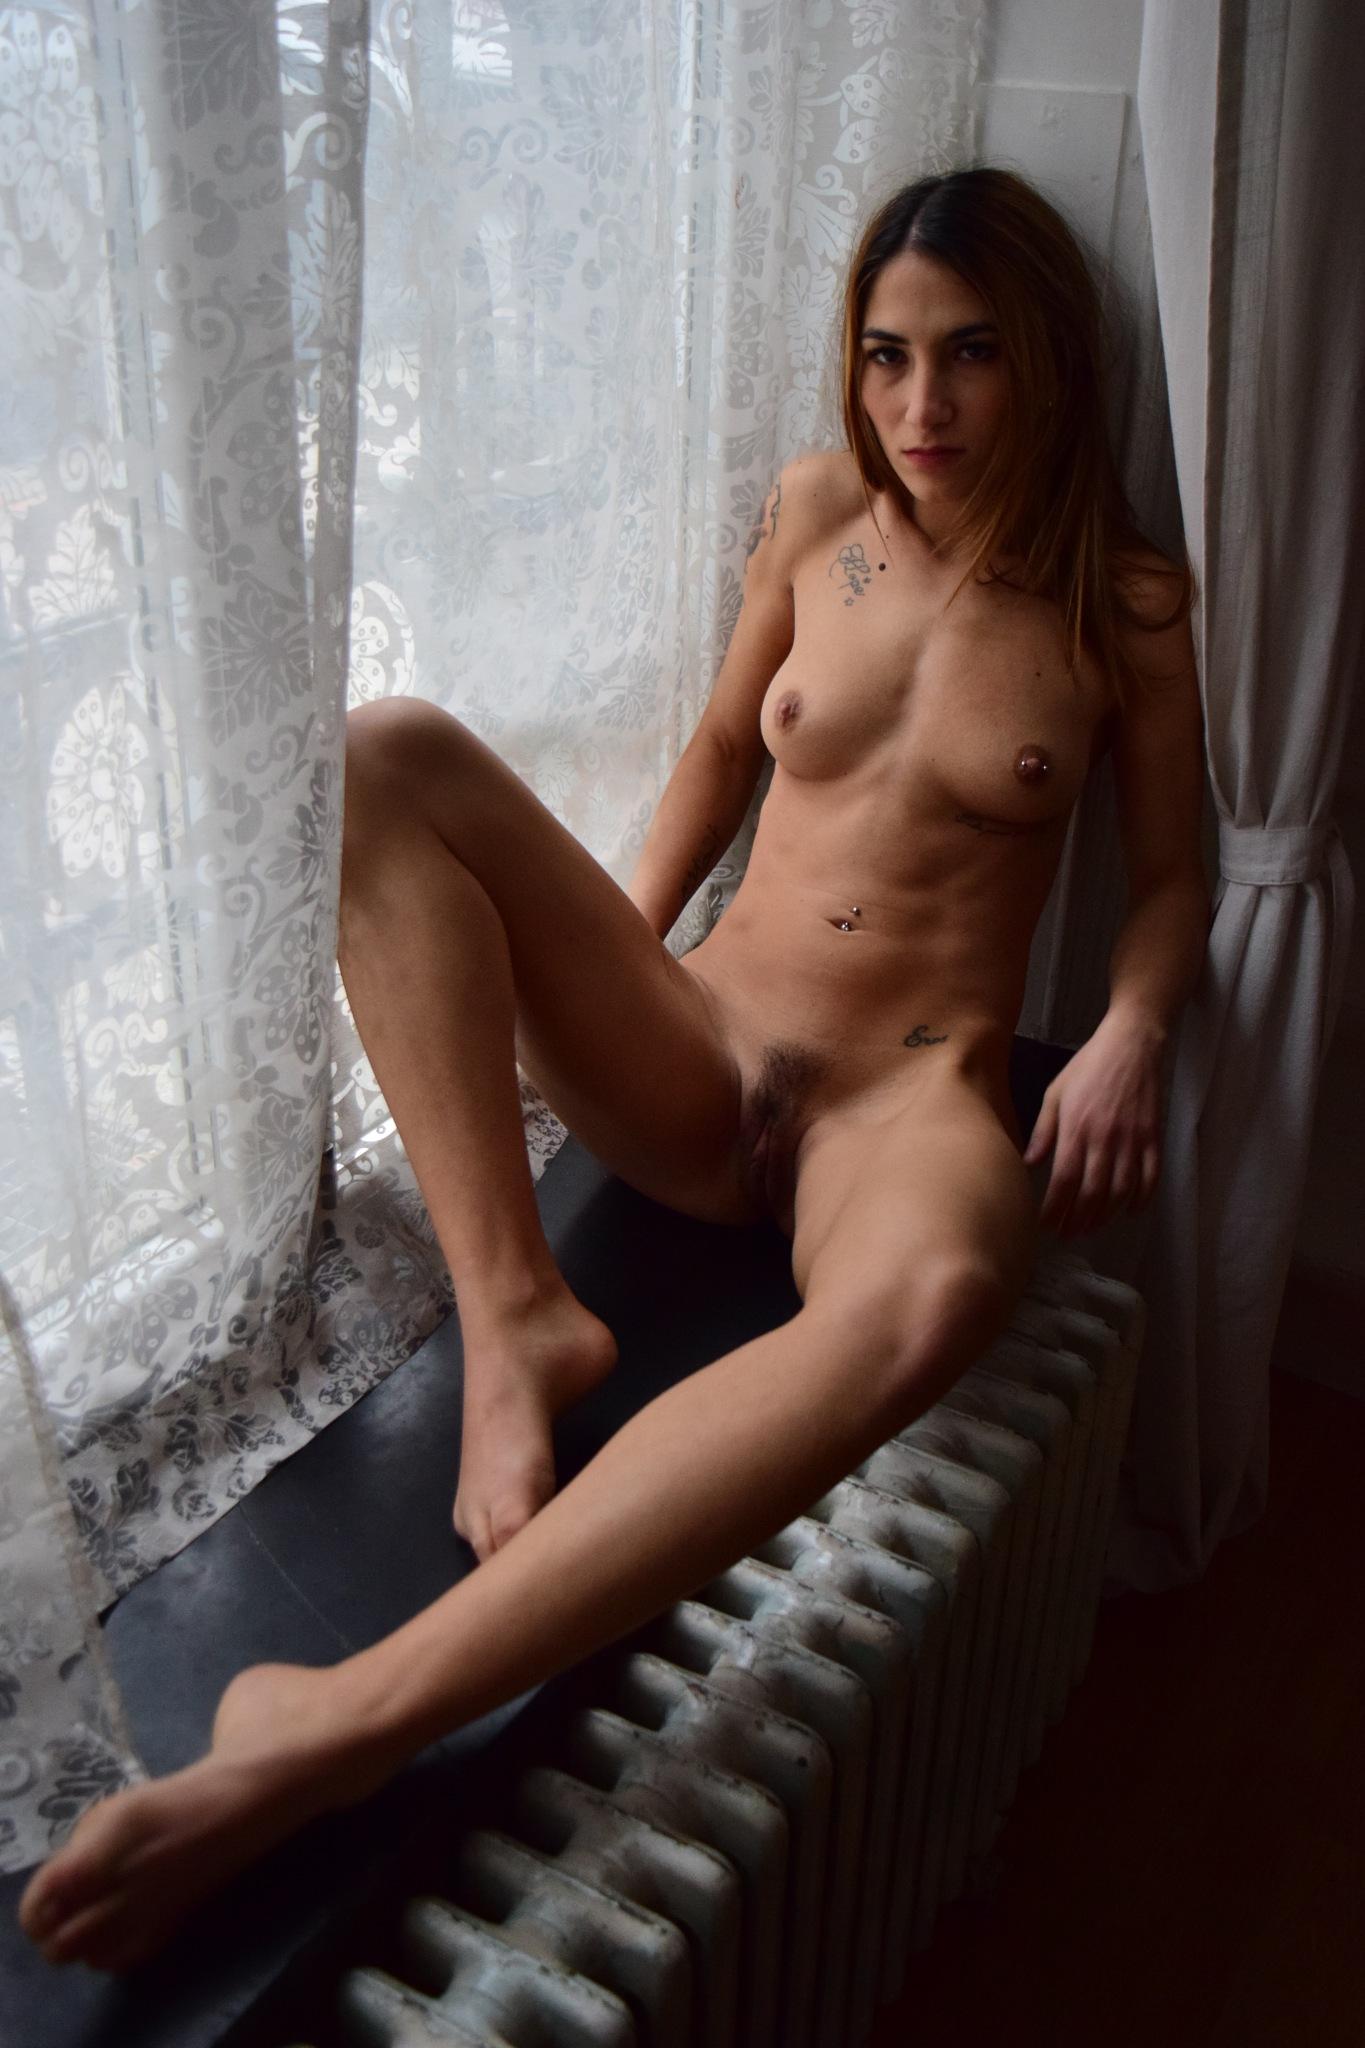 Sophia by Phoenix Photography